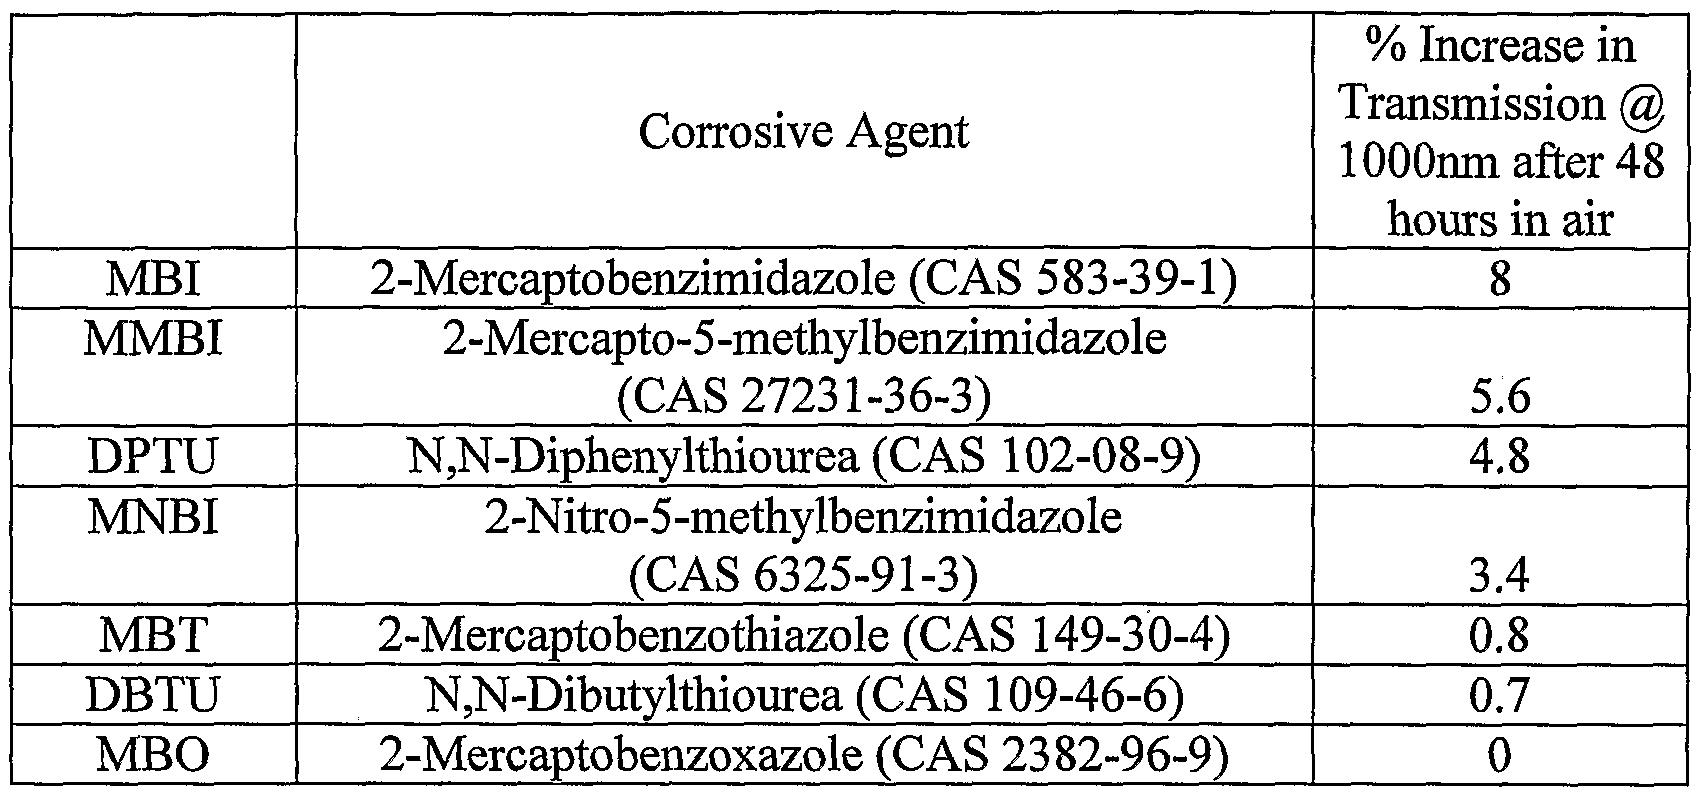 nero 6 6.1 4 serial number